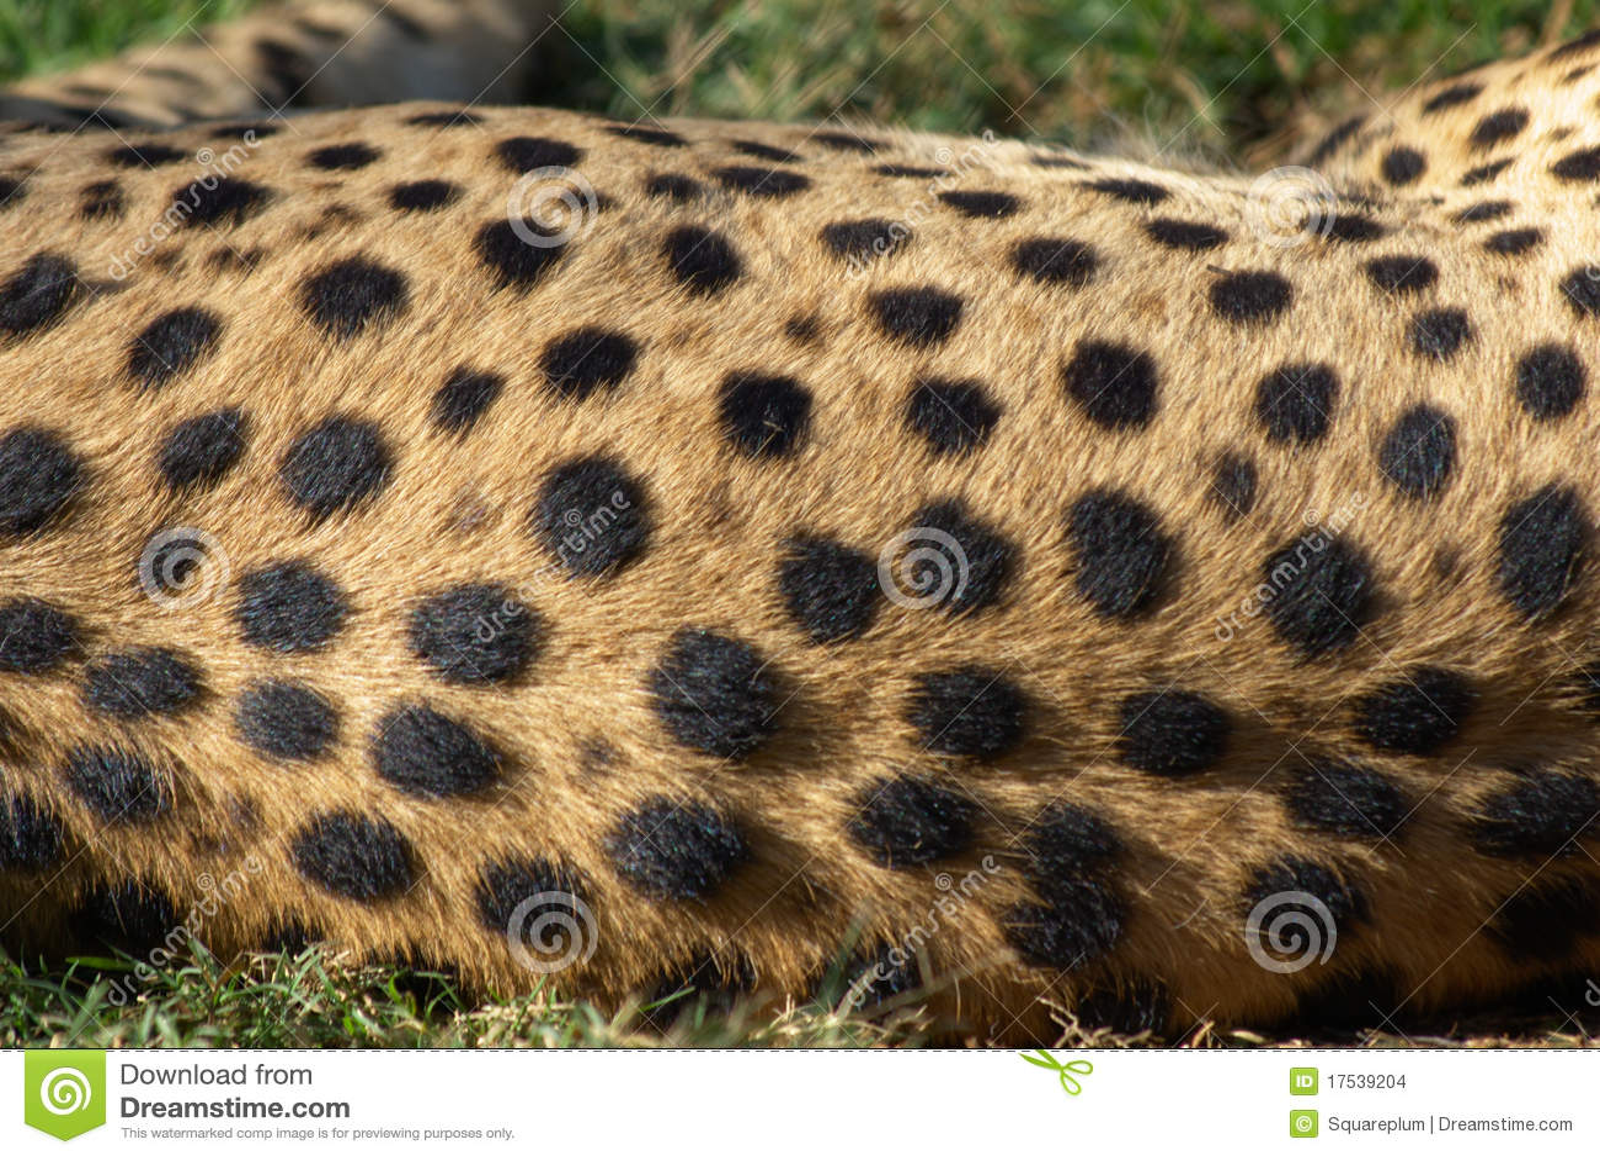 Cheetah Fur Close Up Cheetah fur Stock Images